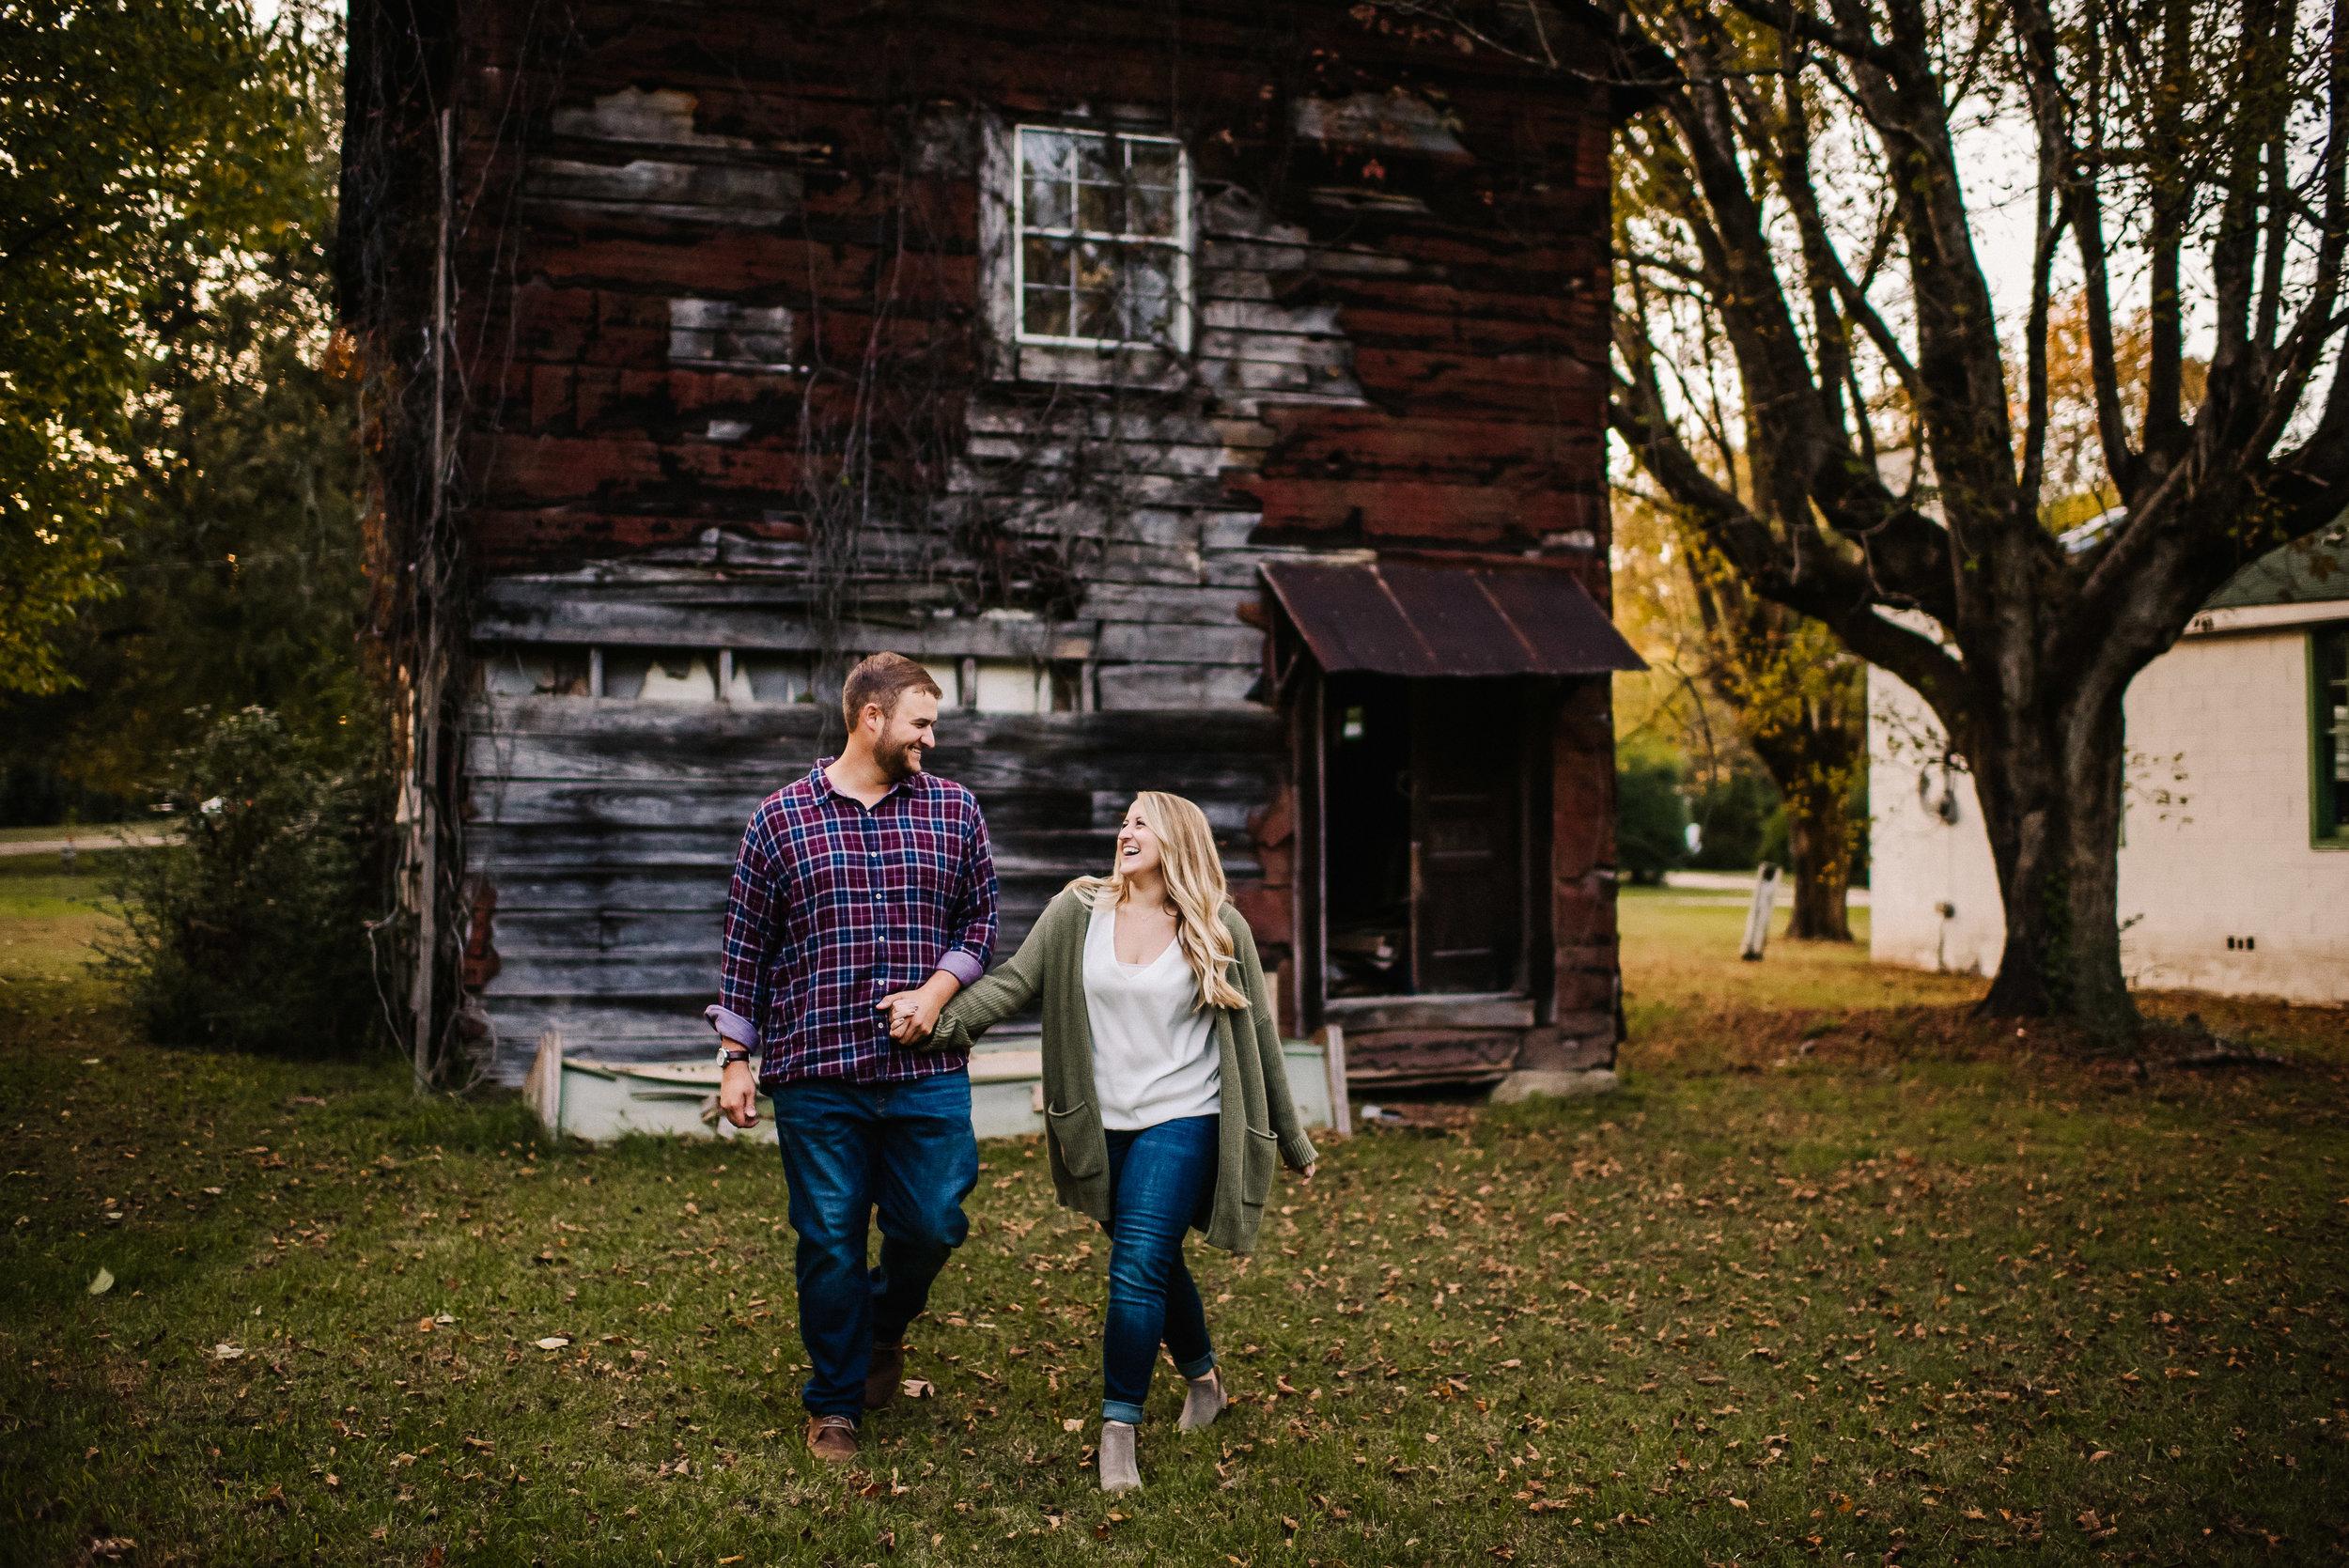 Romantic Fall Engagement Photography_Alexis & Jacob_Ashley Benham Photography-170.jpg